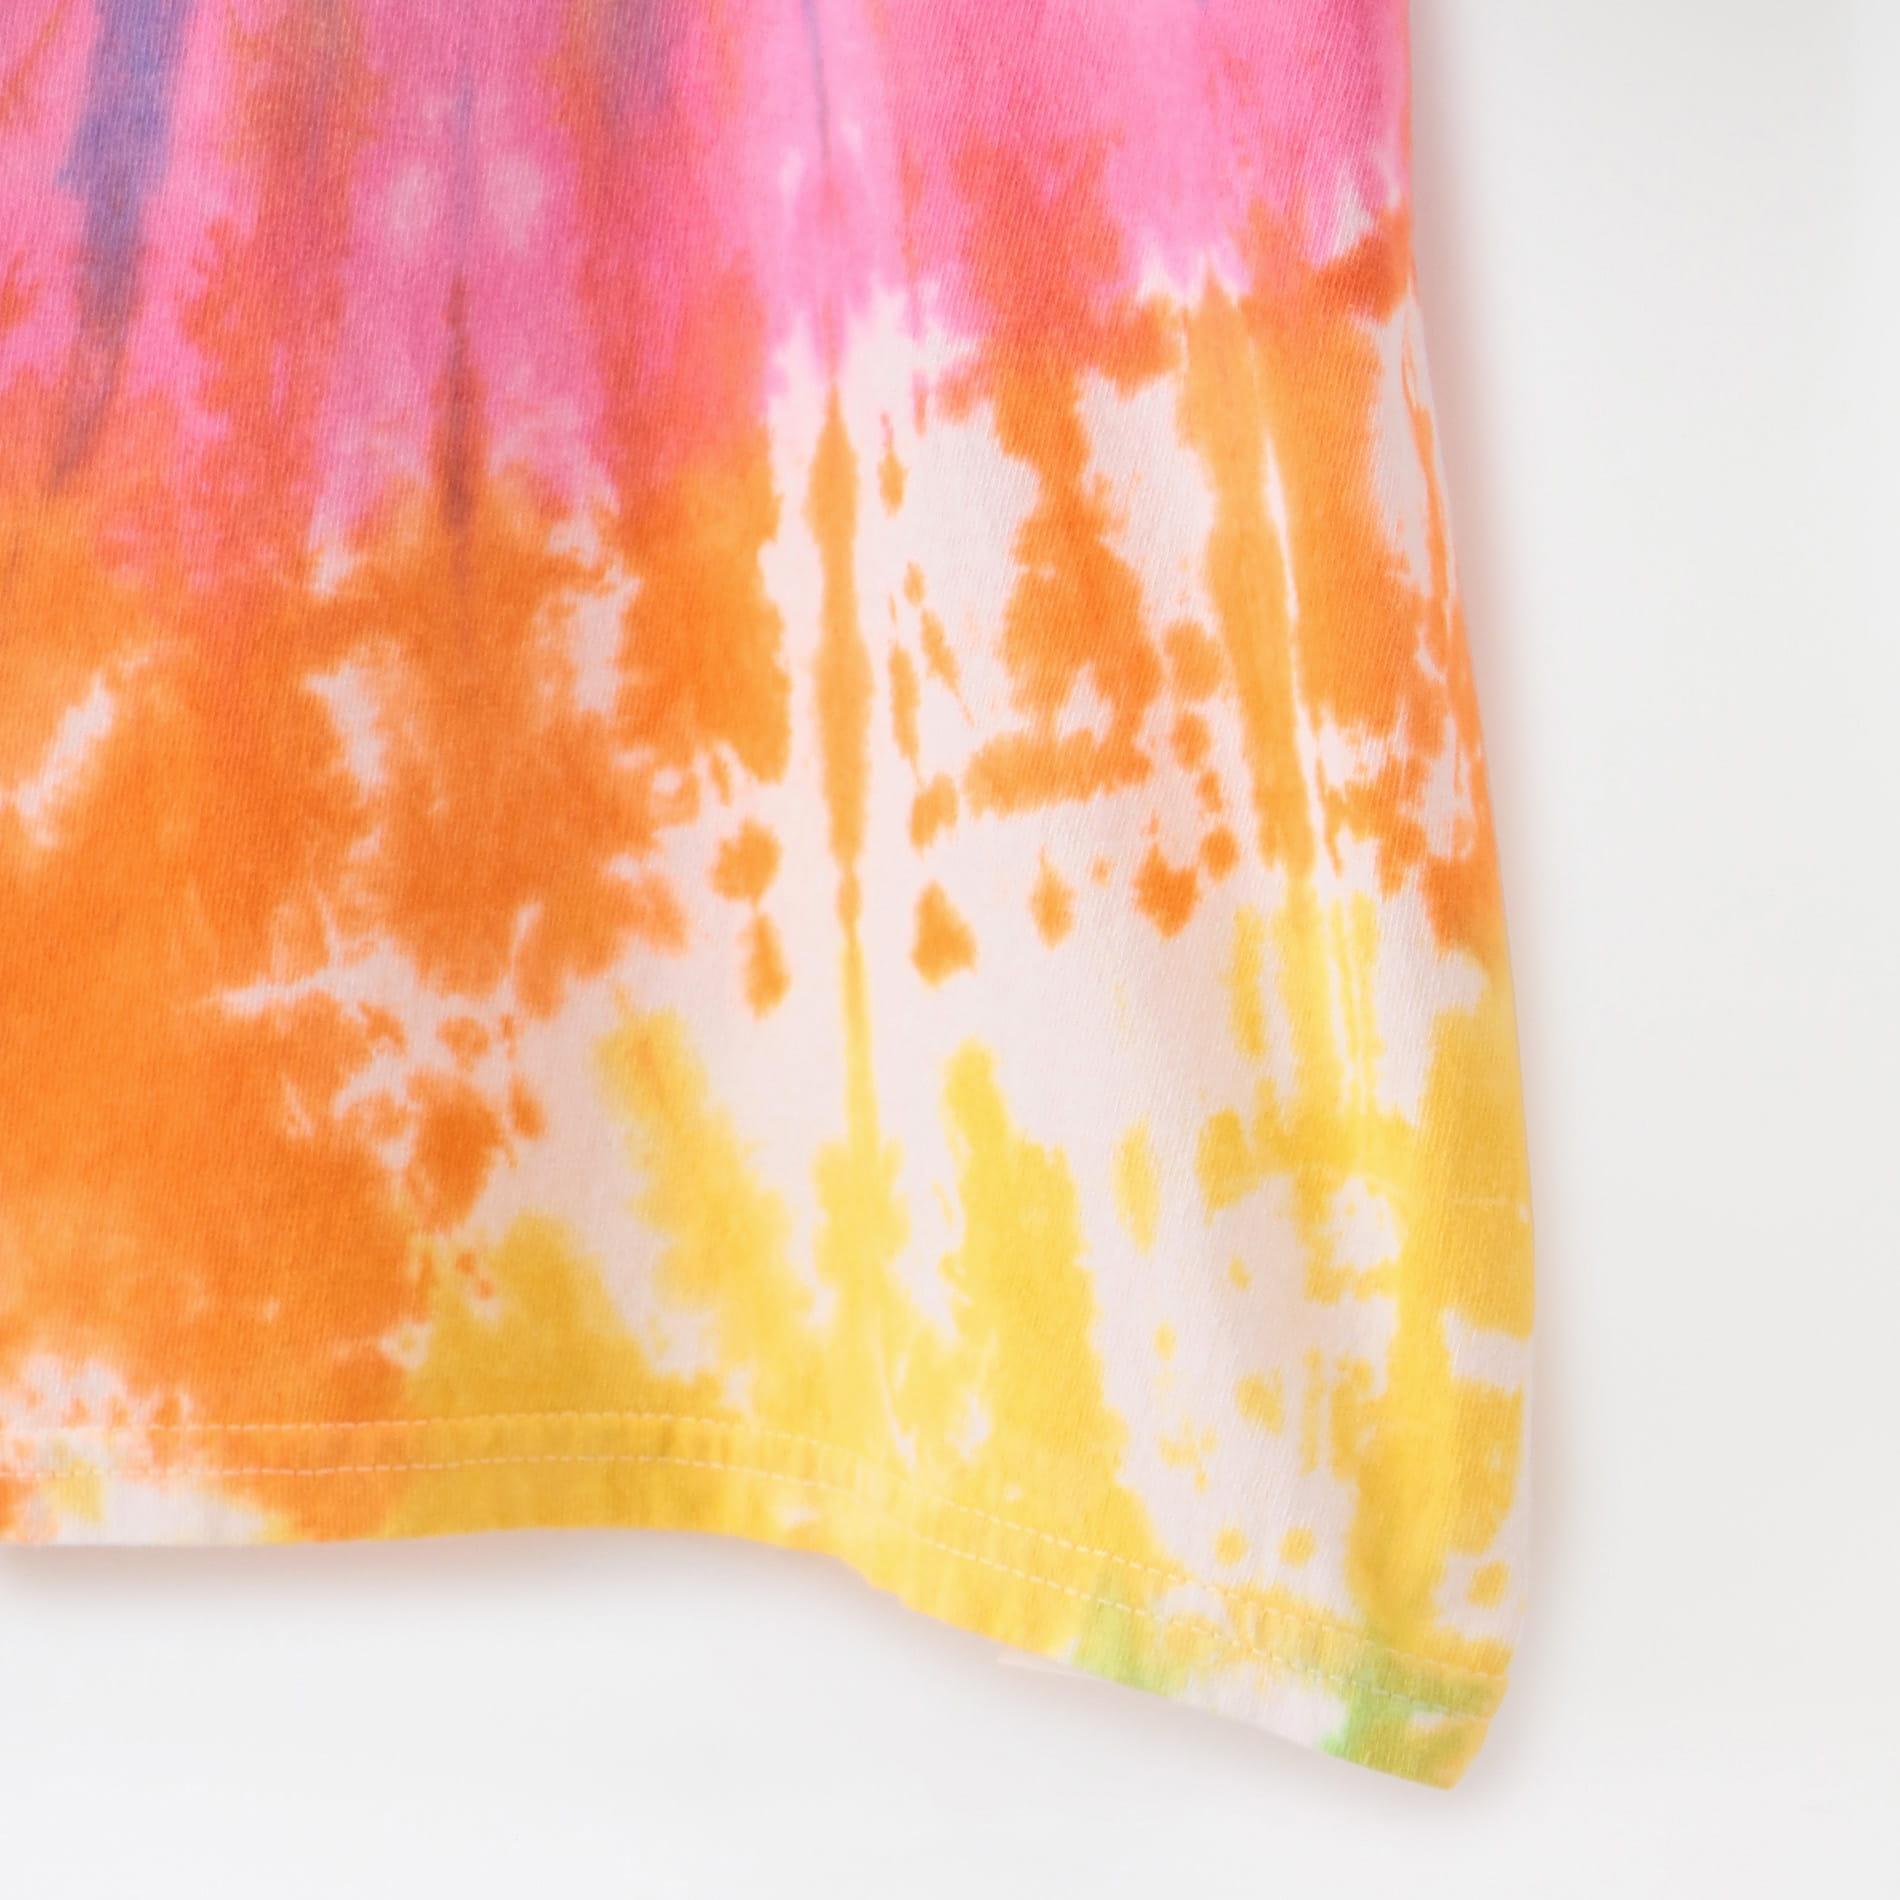 【FACTOTUM】MEN Tie dye S/S T-shirts TRIANGLE 1080939